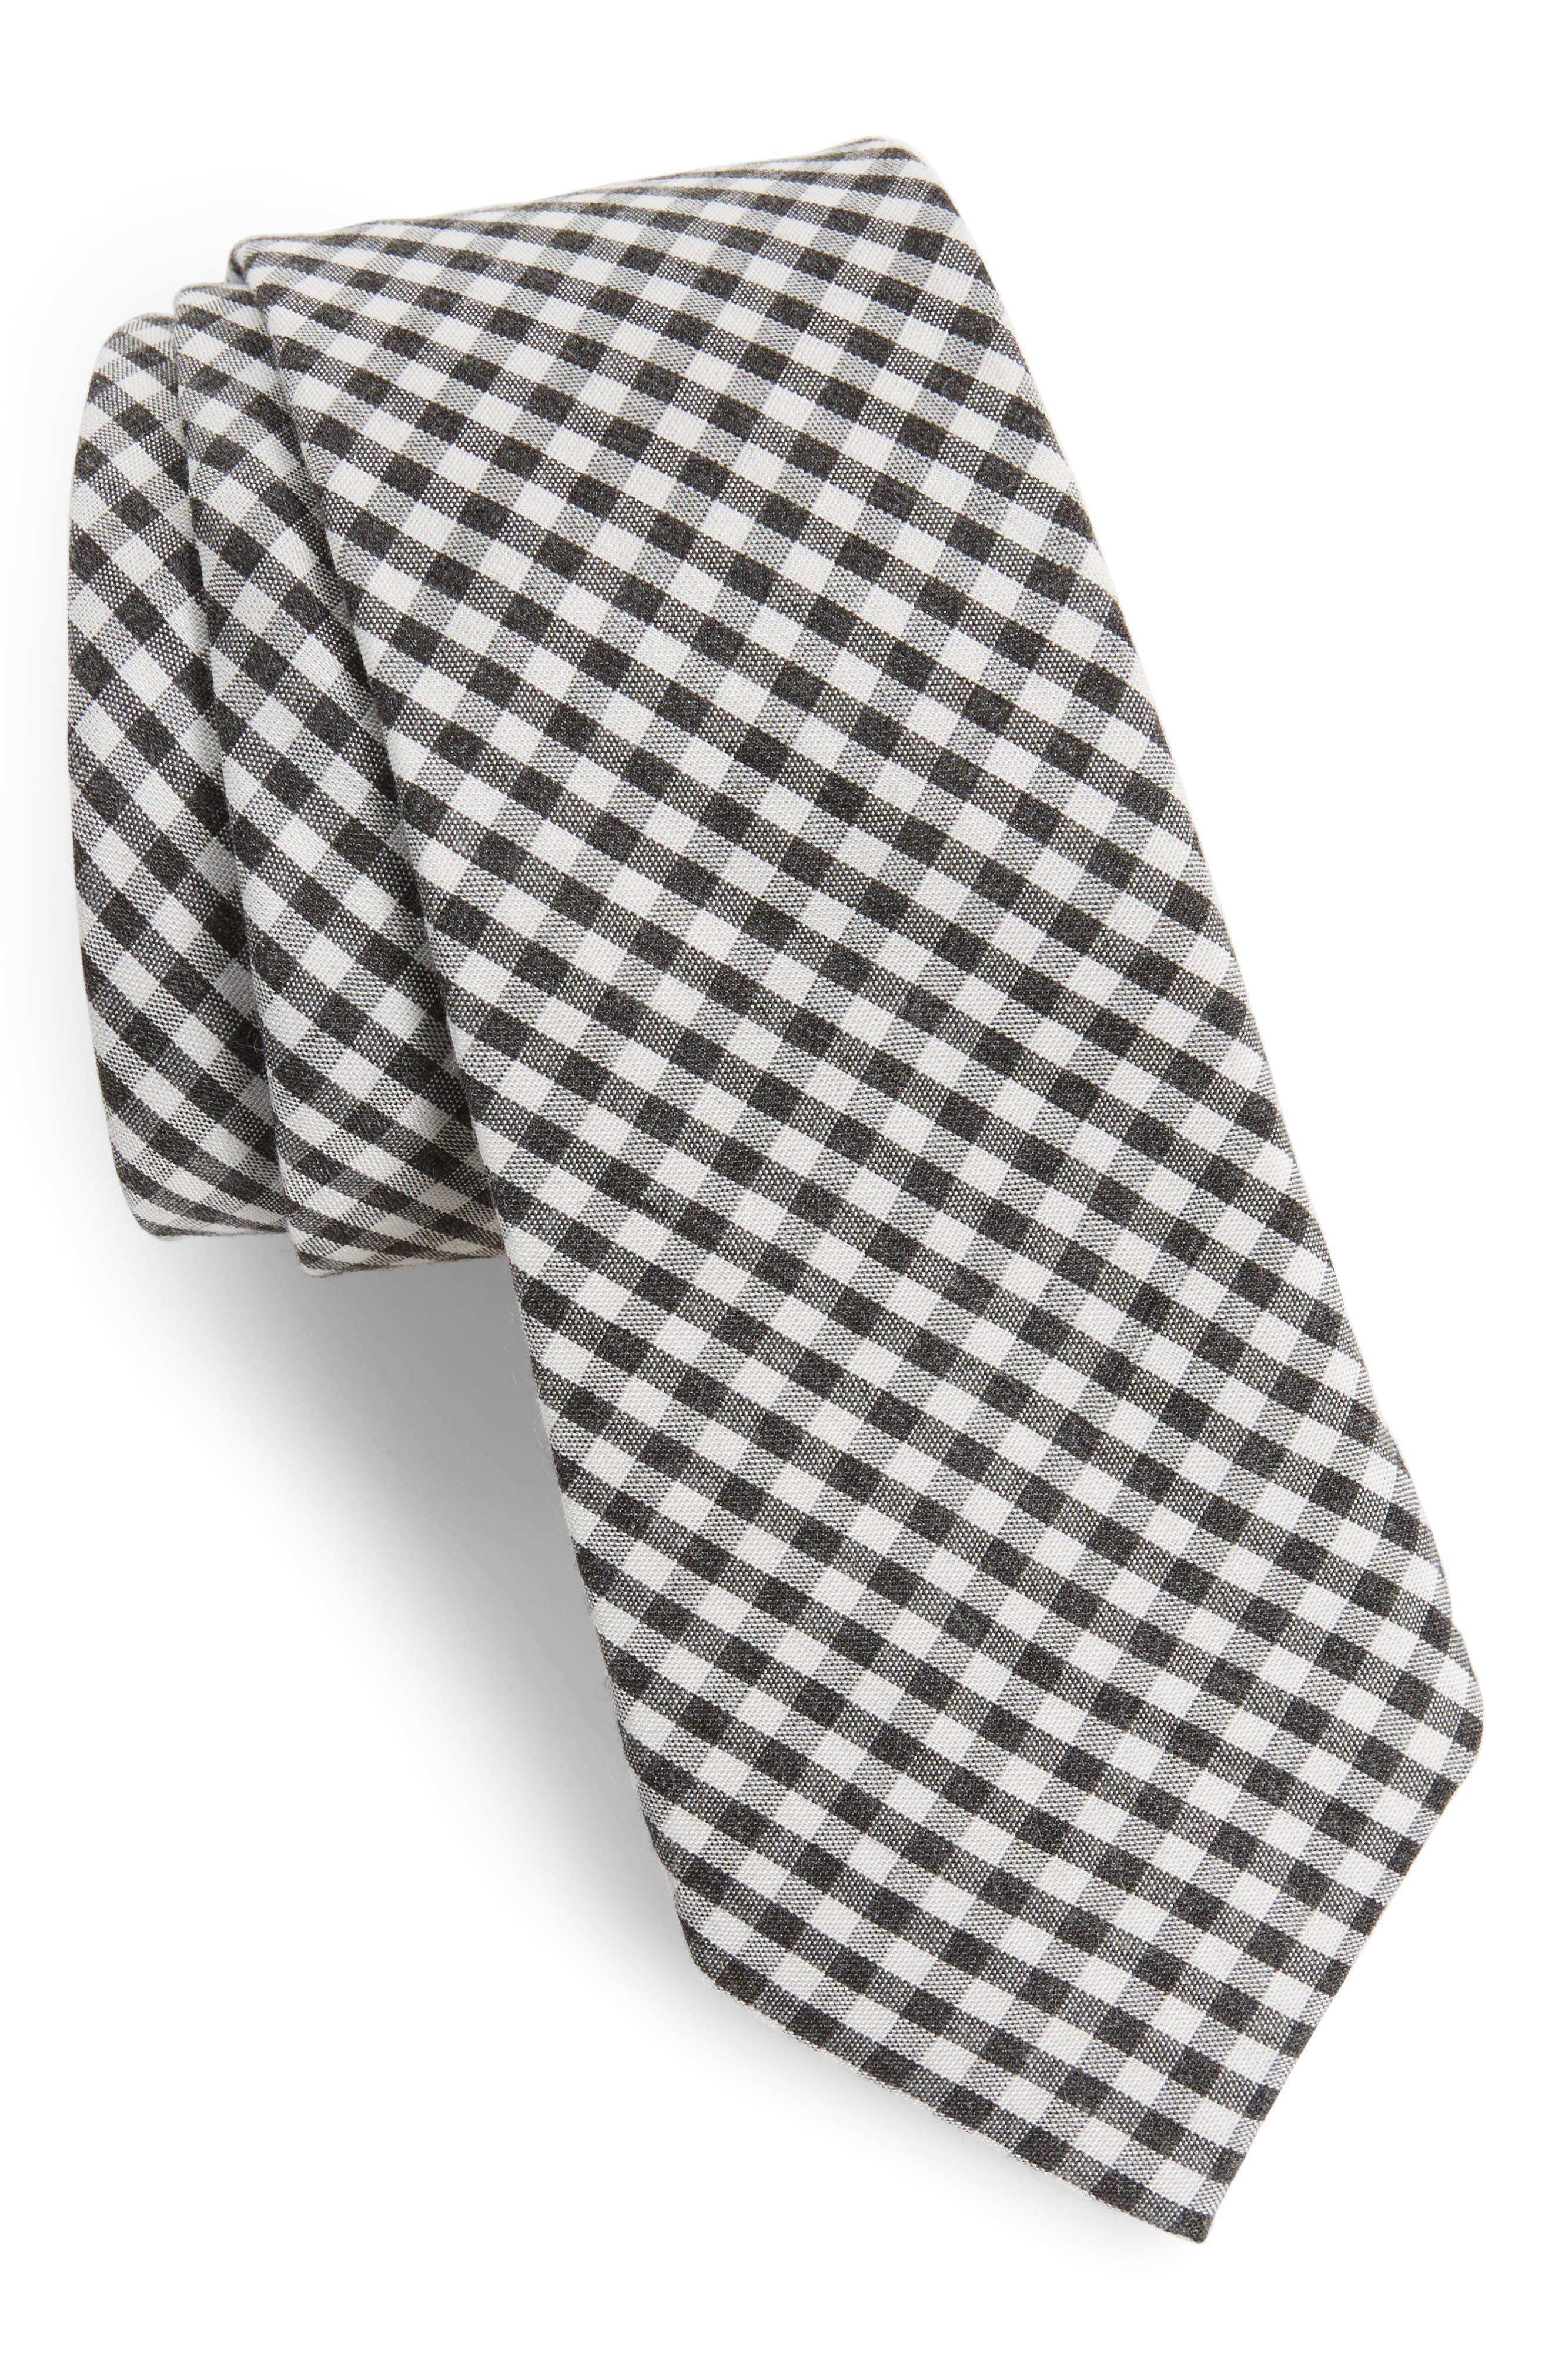 Cahill Check Skinny Tie,                             Main thumbnail 1, color,                             001